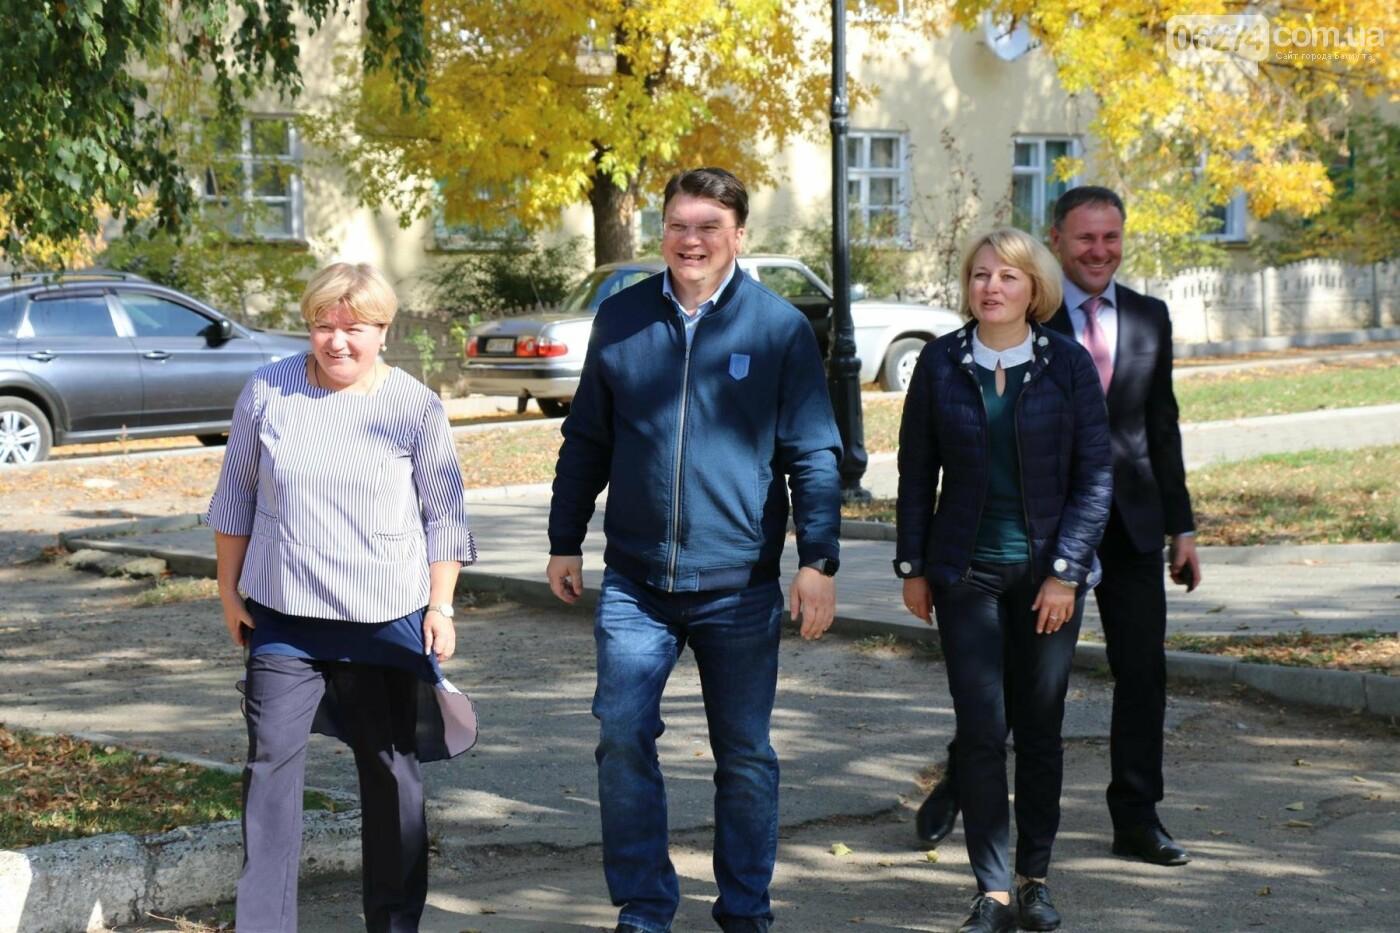 Бахмут посетил министр молодежи и спорта Украины, фото-1